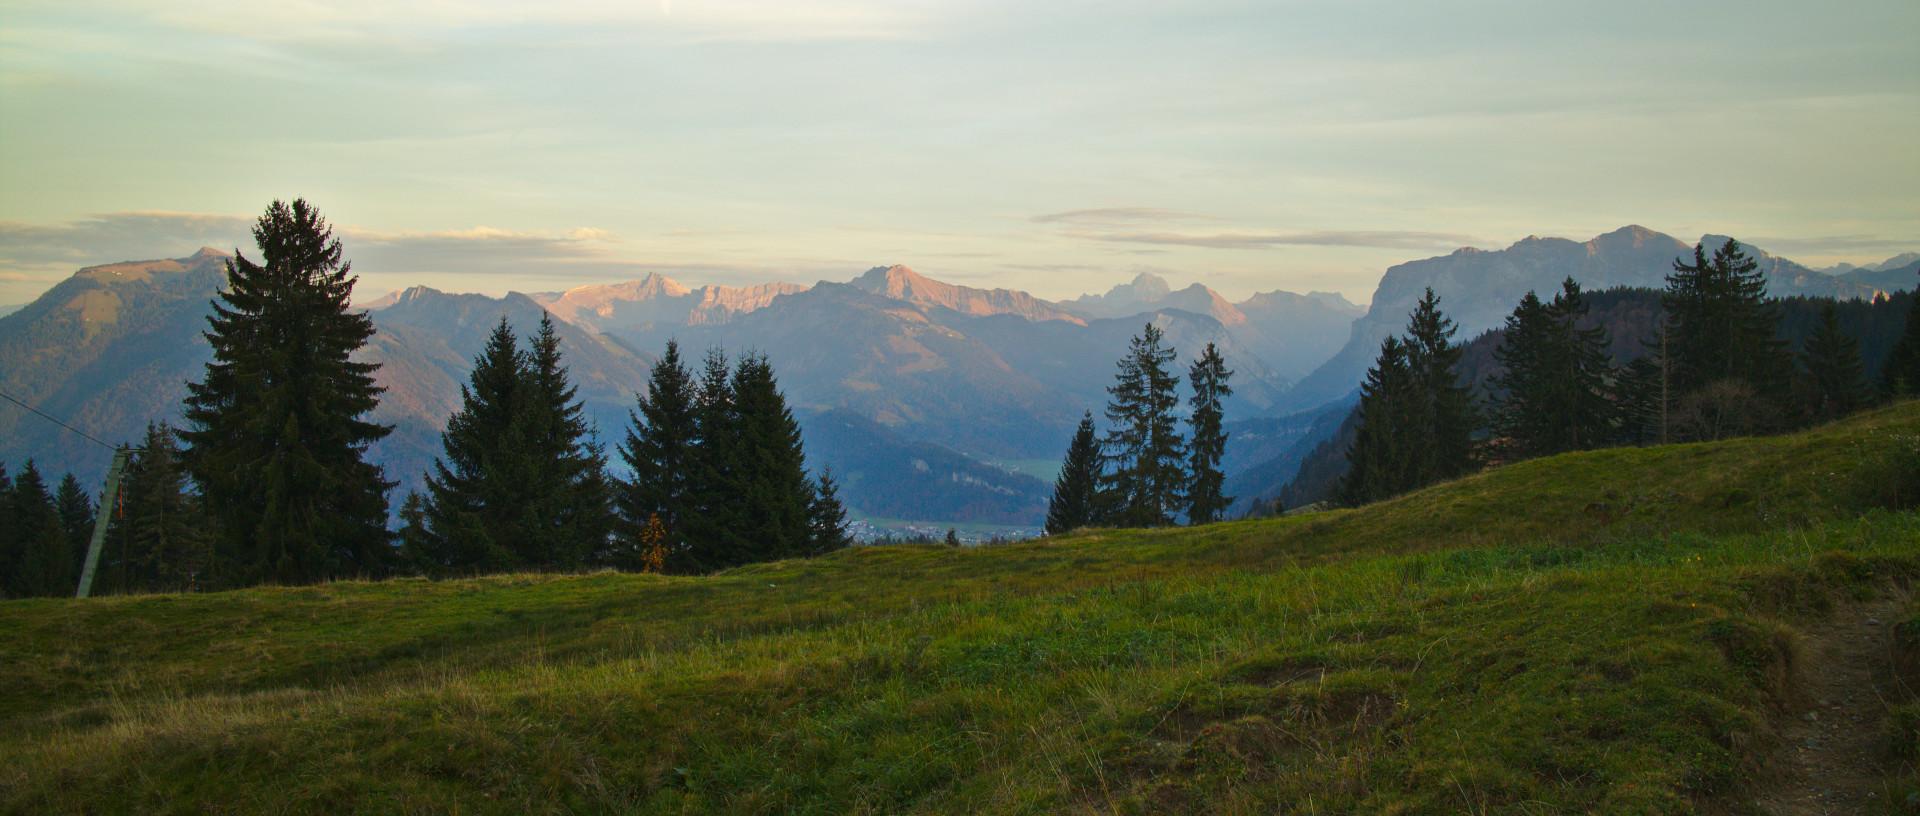 panoramic view of a mountain range